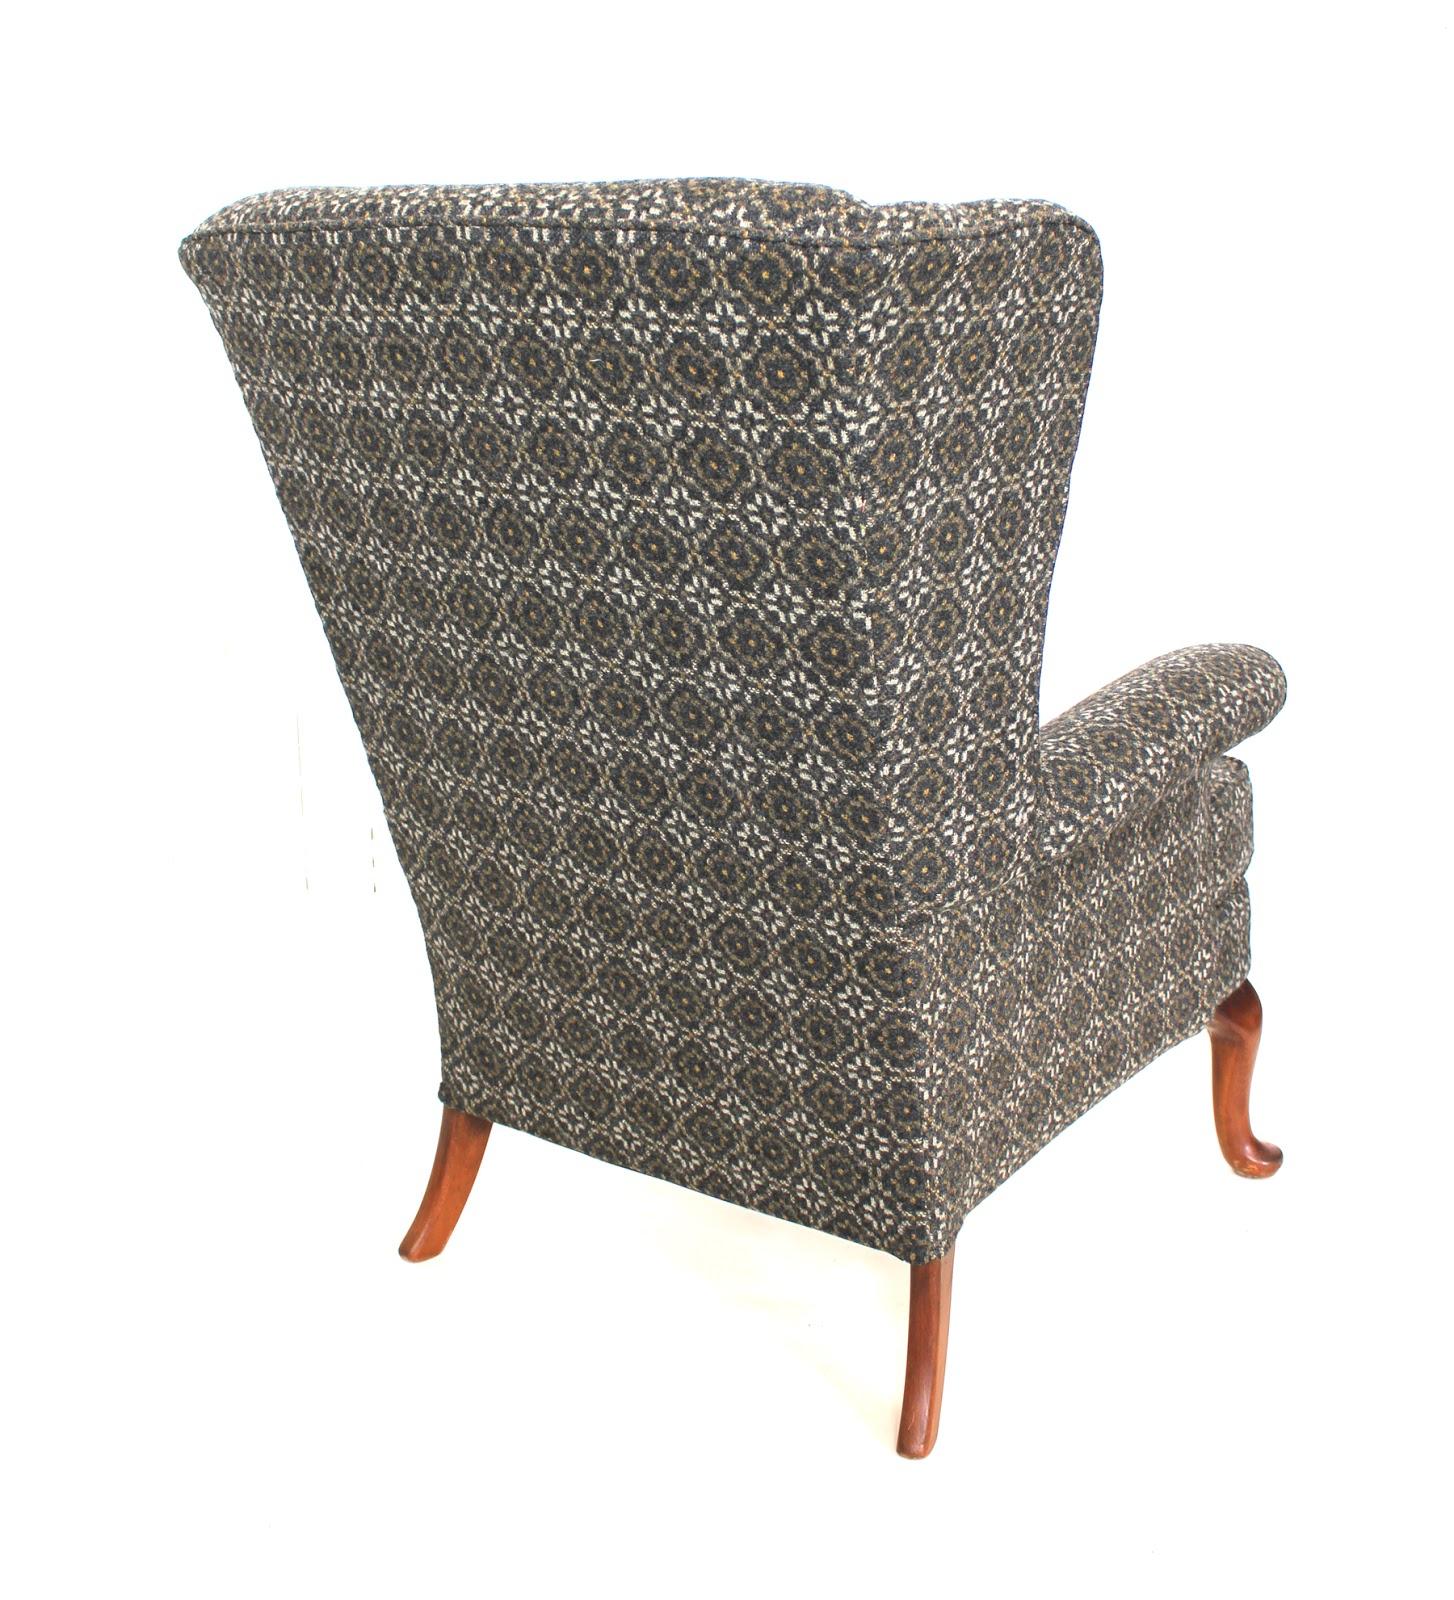 mick sheridan upholstery parker knoll armchair in melin tregwynt